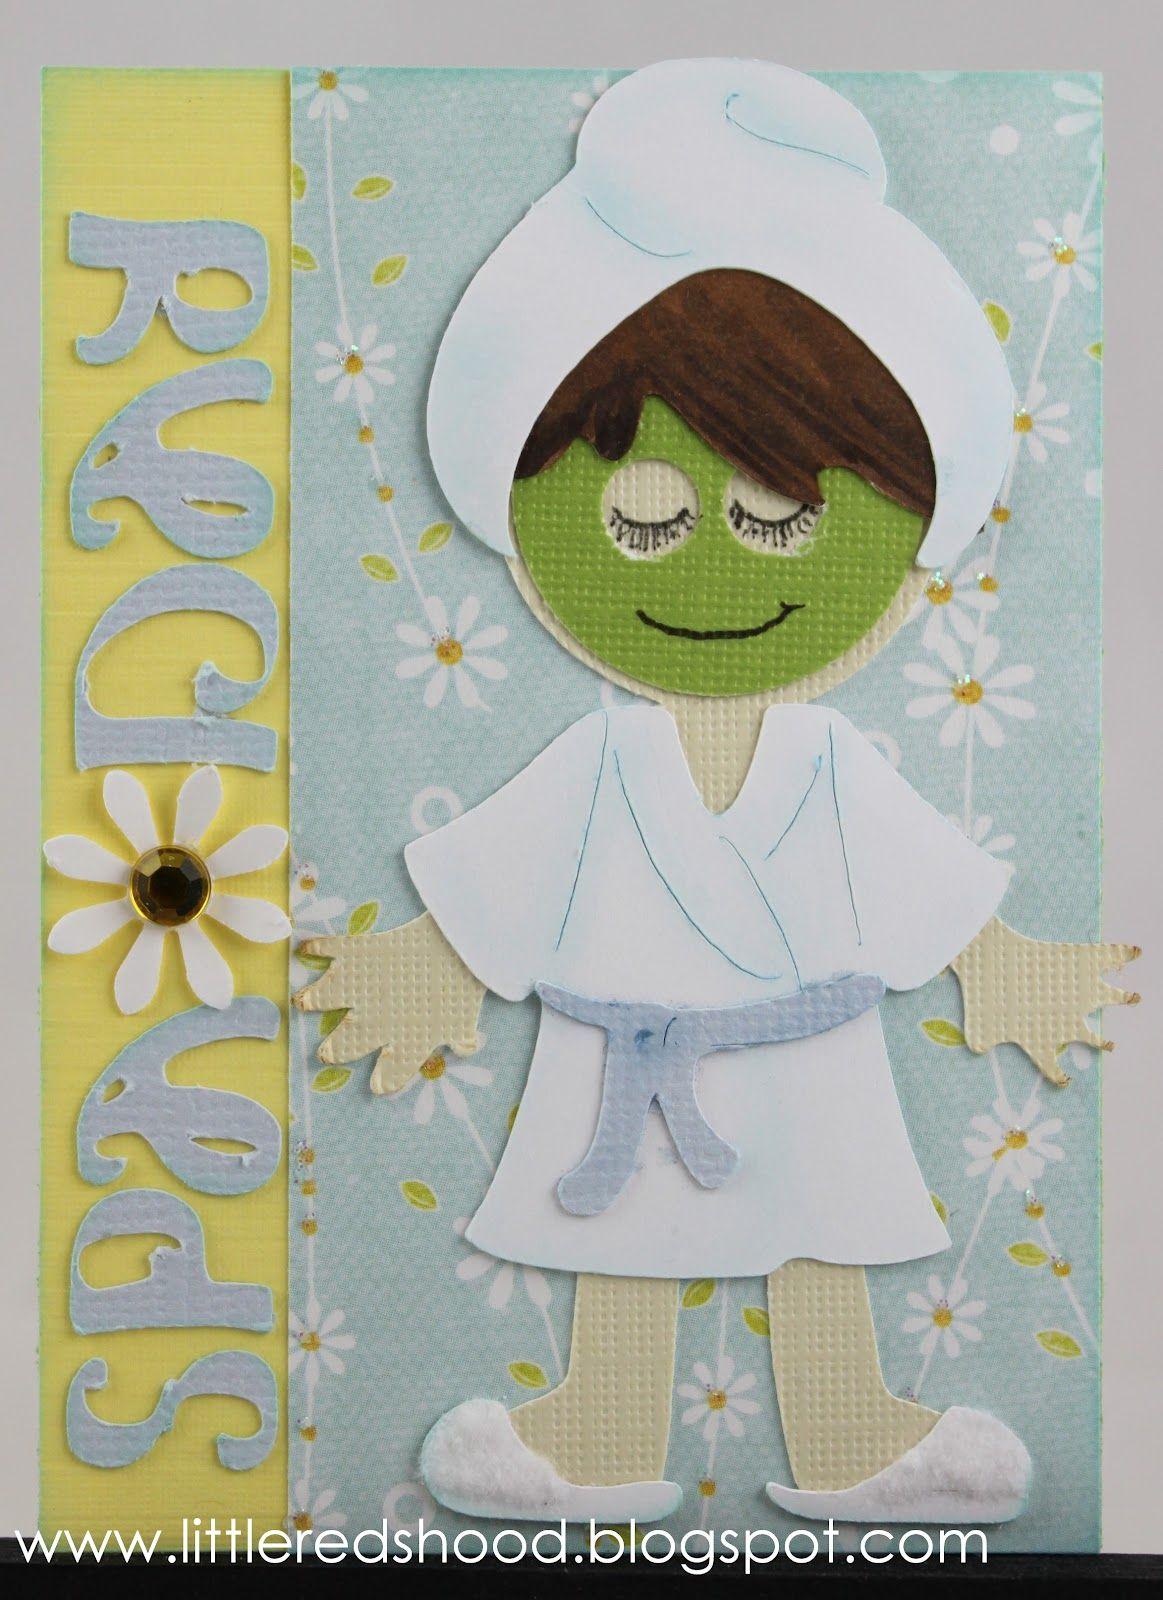 ॣ•͈ᴗ•͈ ॣ) Sally | Paper dolls, Vintage paper dolls, Paper ...  |Everyday Paper Dolls Pattern